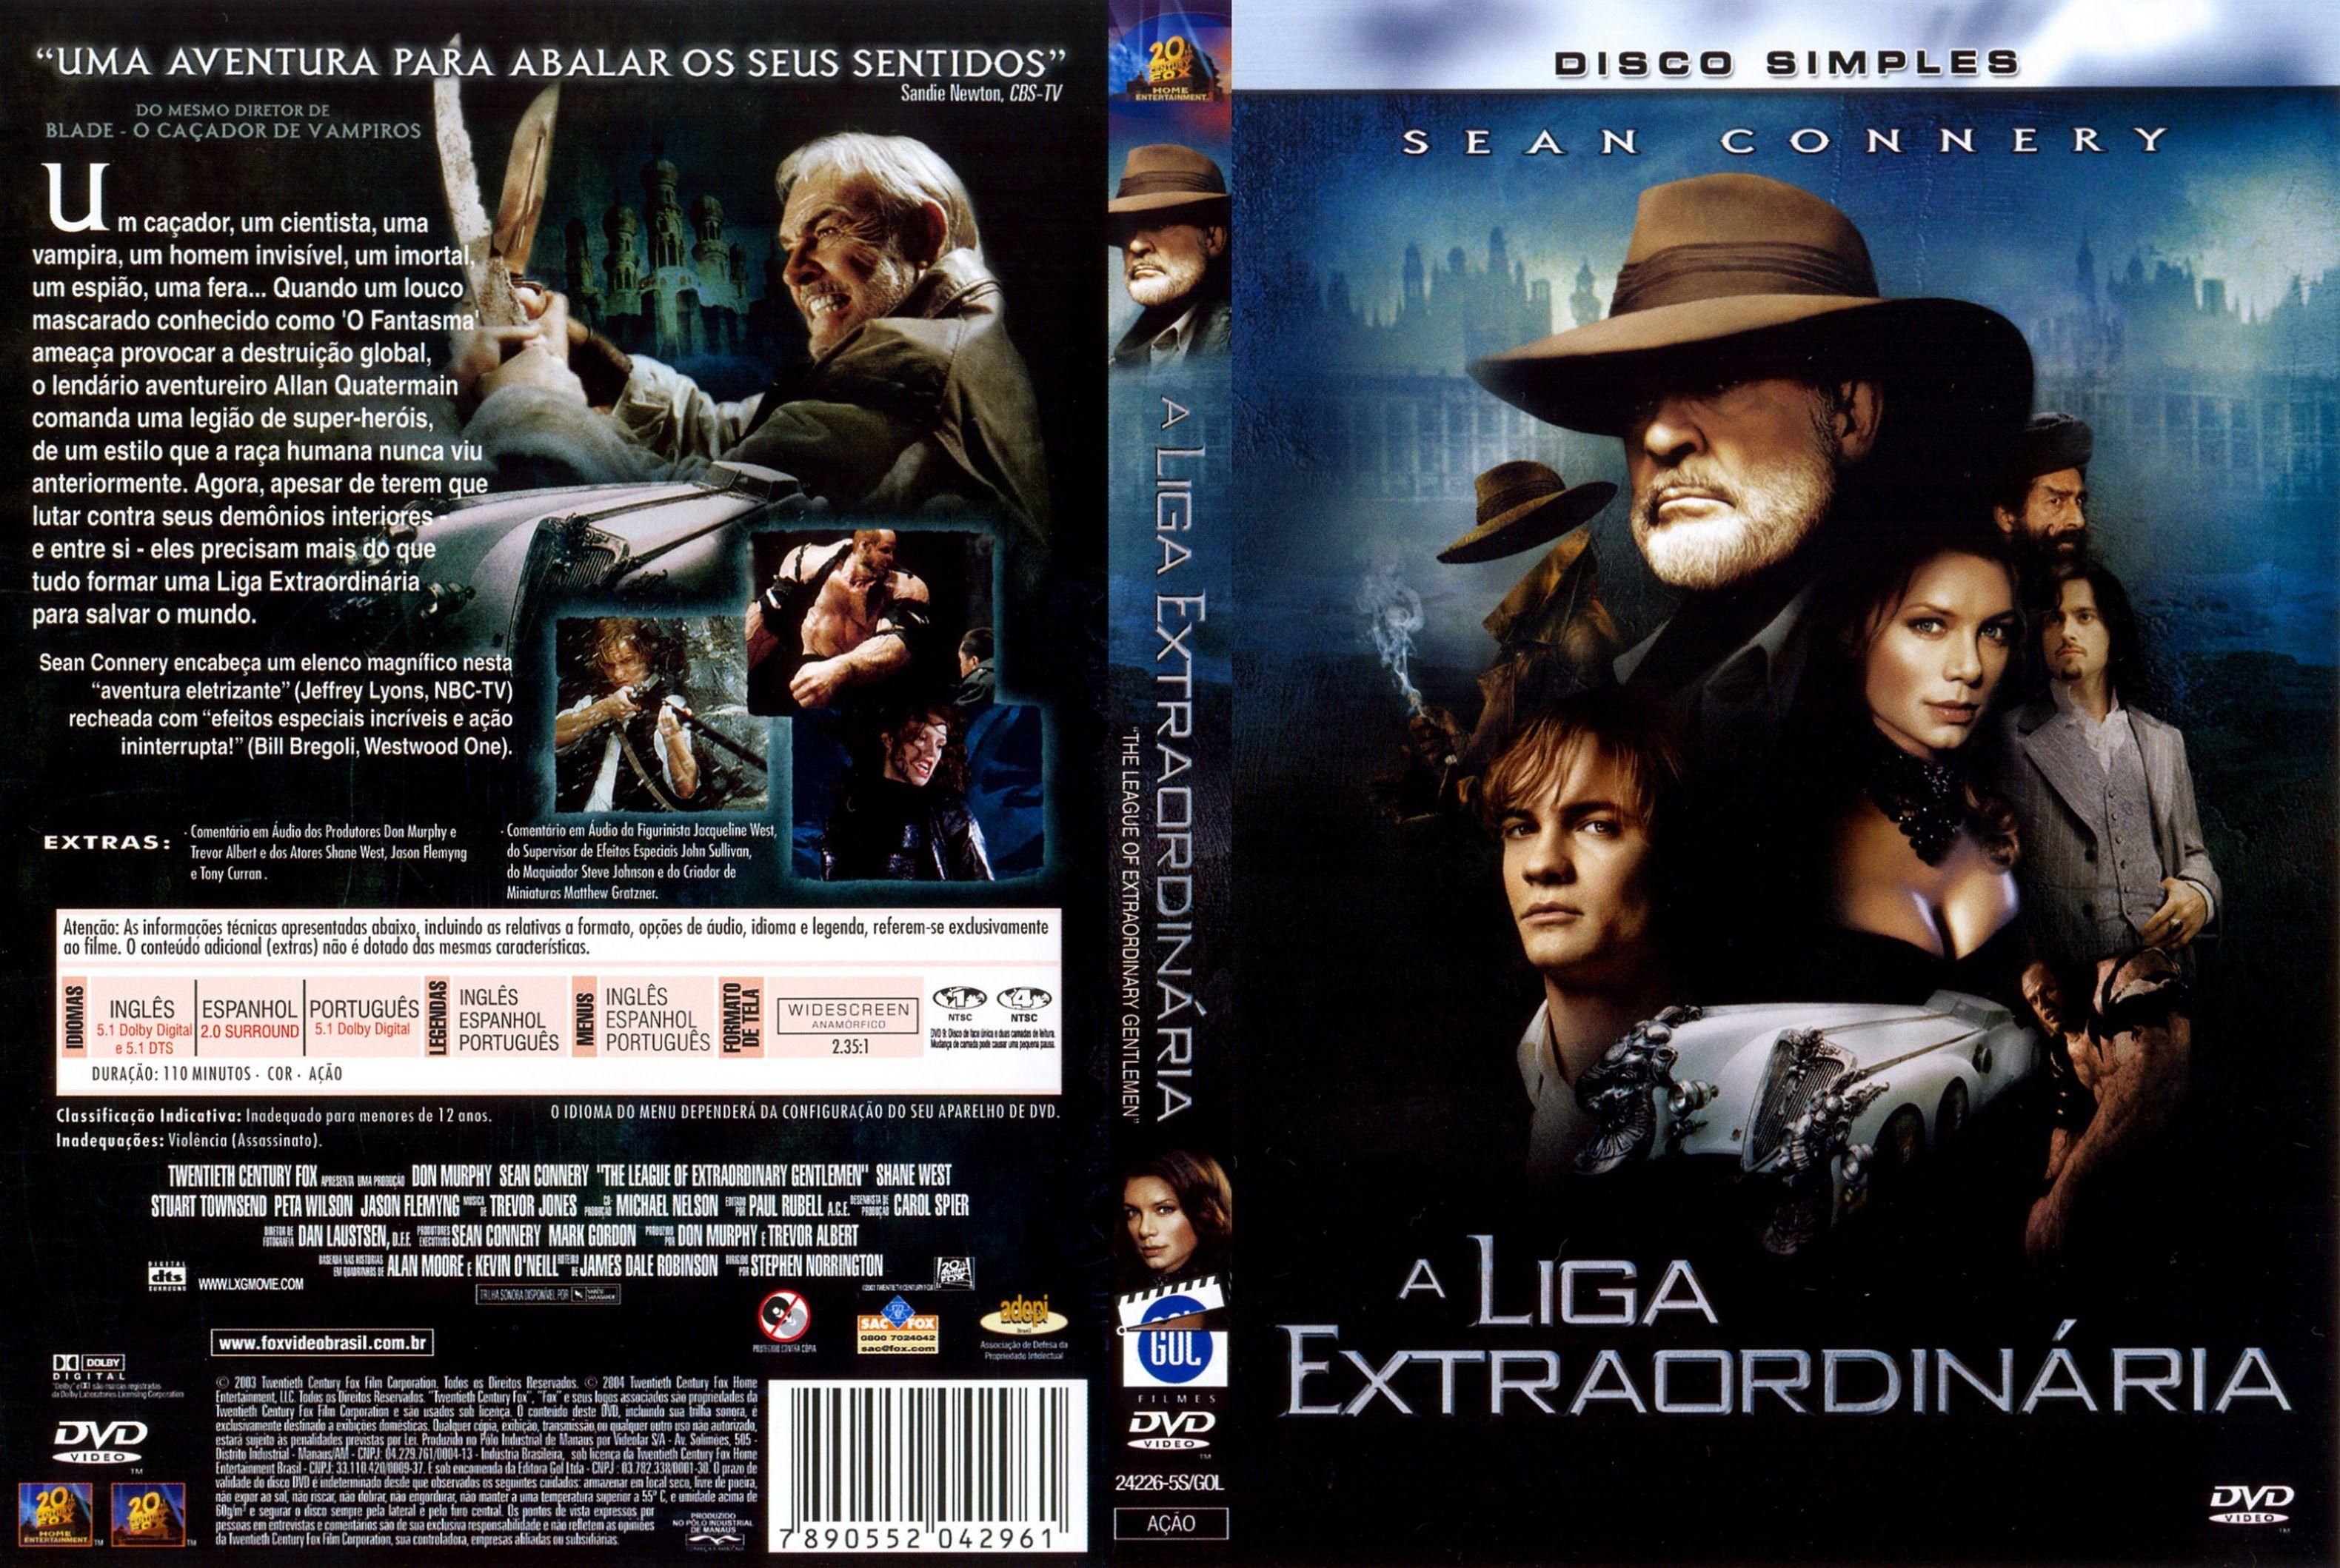 A Liga Extraordinaria Filmes A Liga Extraordinaria